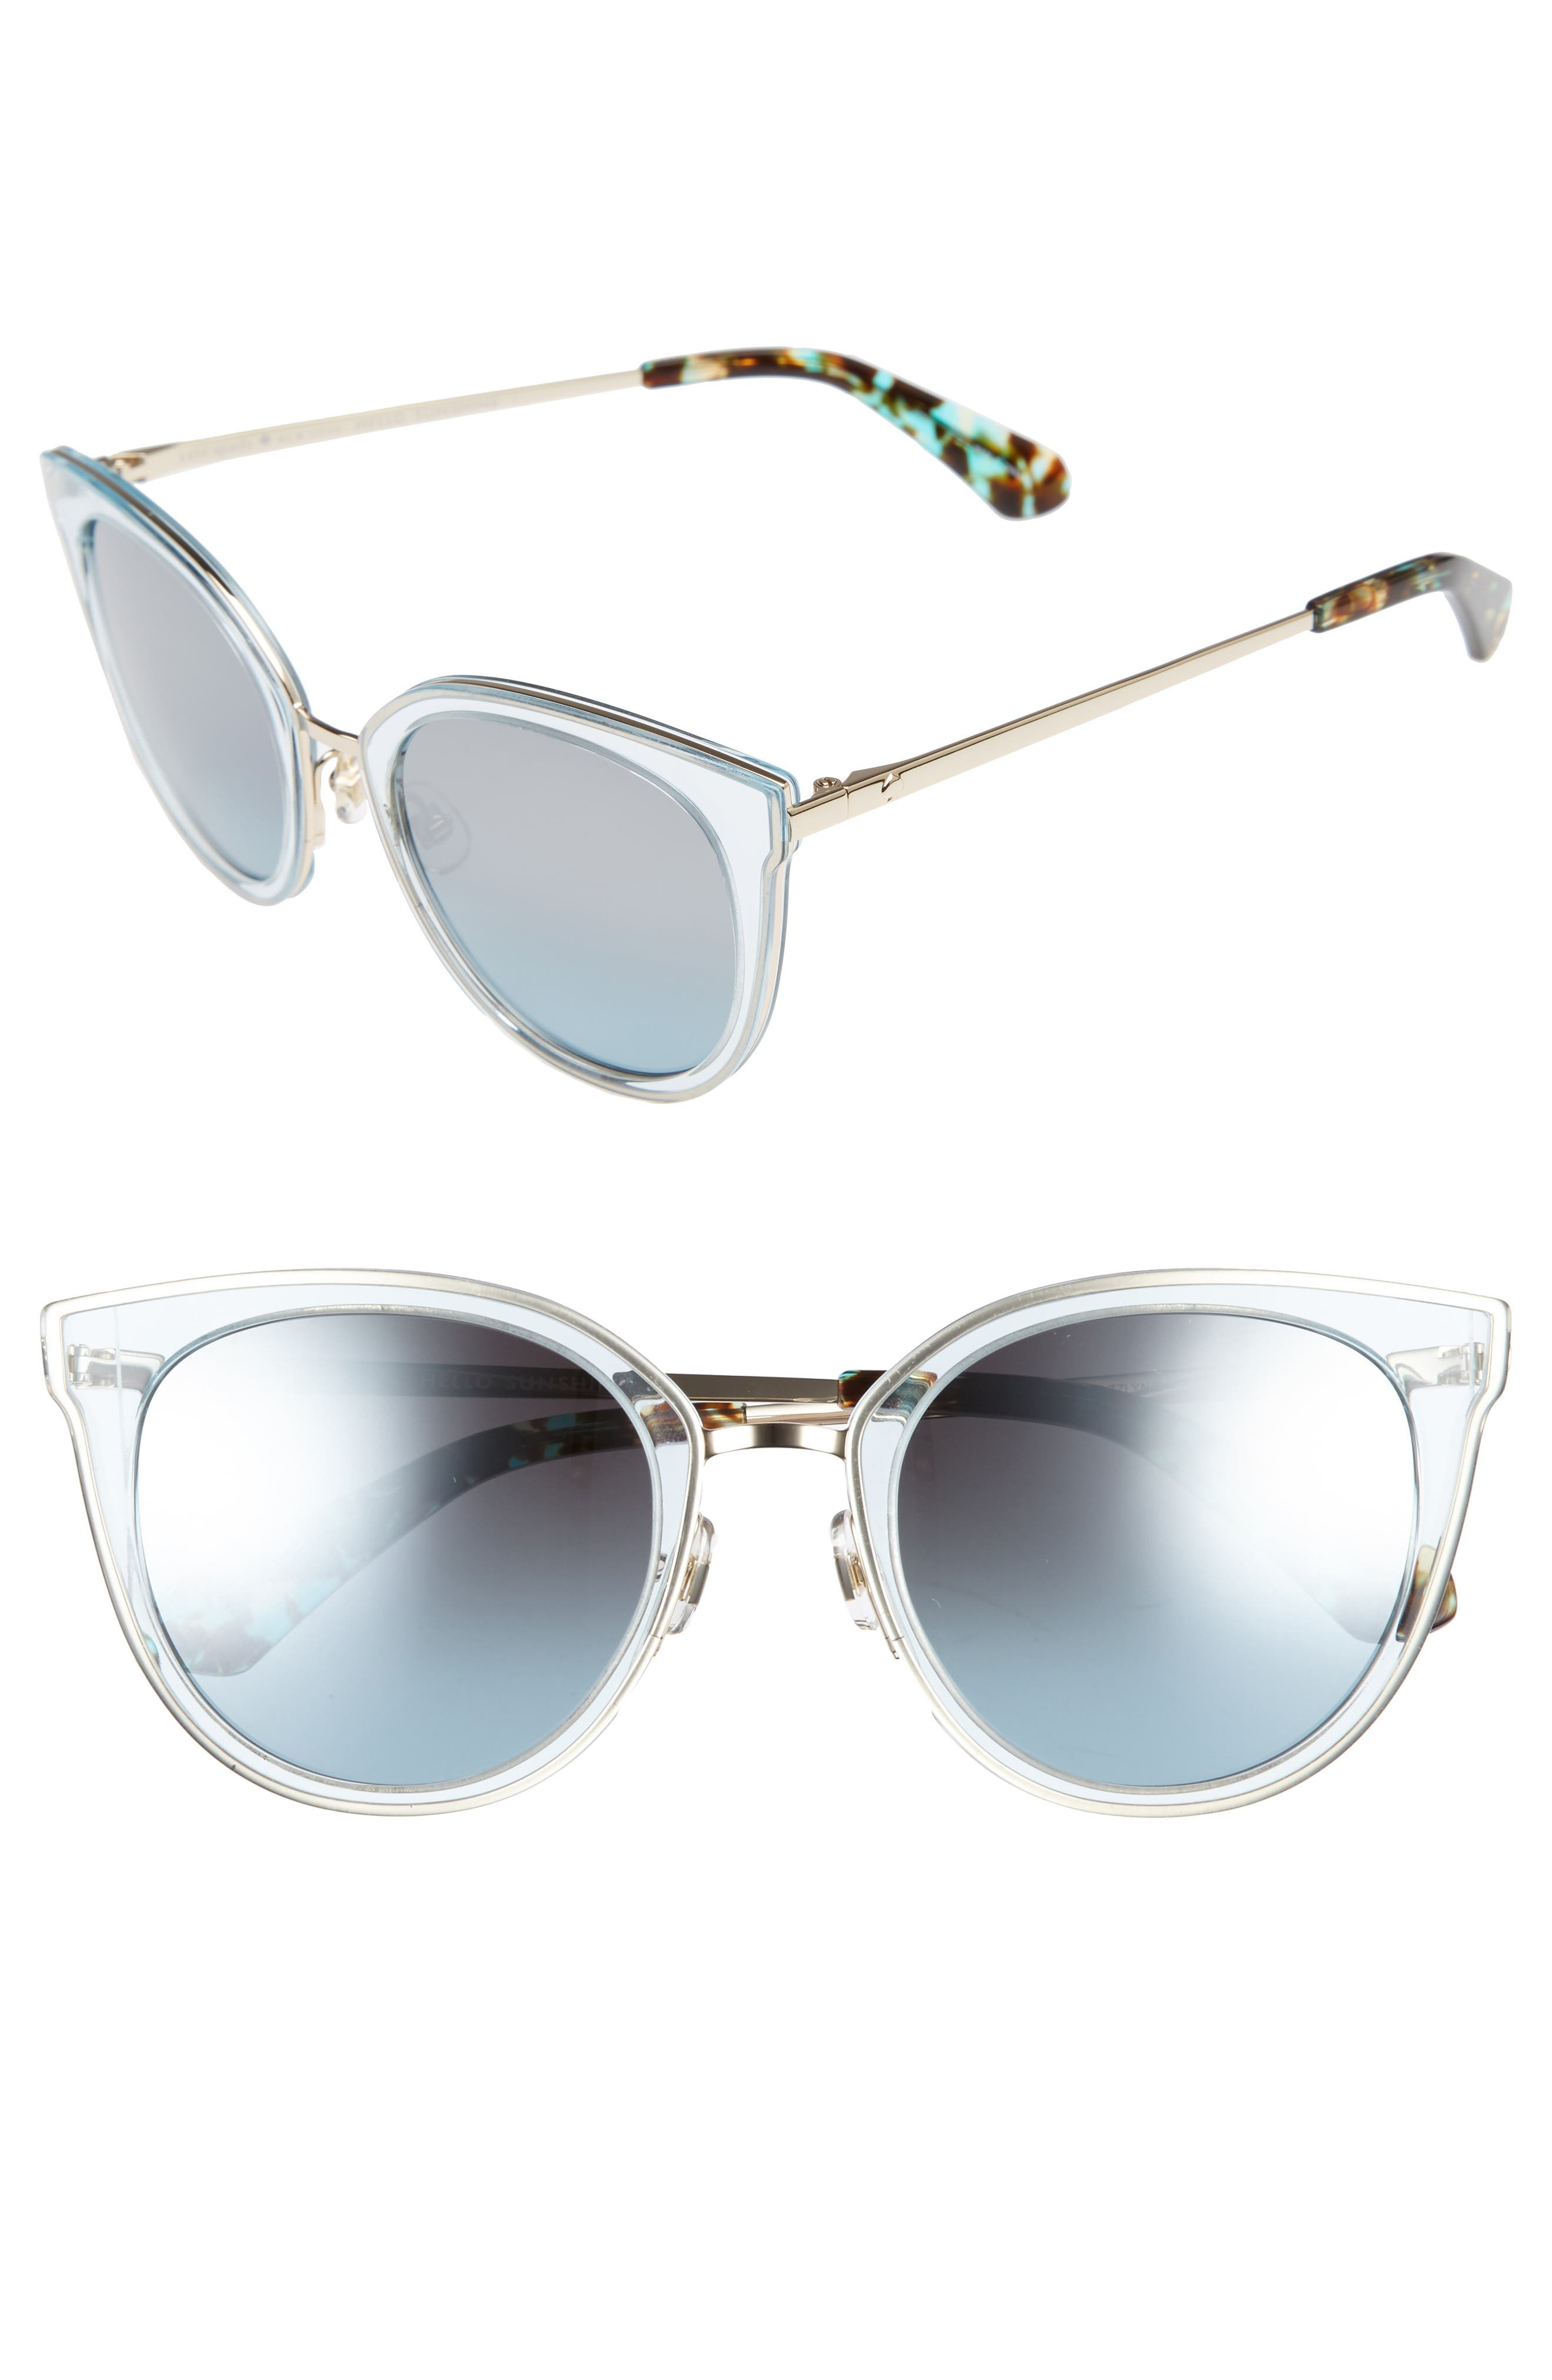 jazzlyn 51mm Cat Eye Sunglasses,                             Main thumbnail 1, color,                             Blue/ Gold